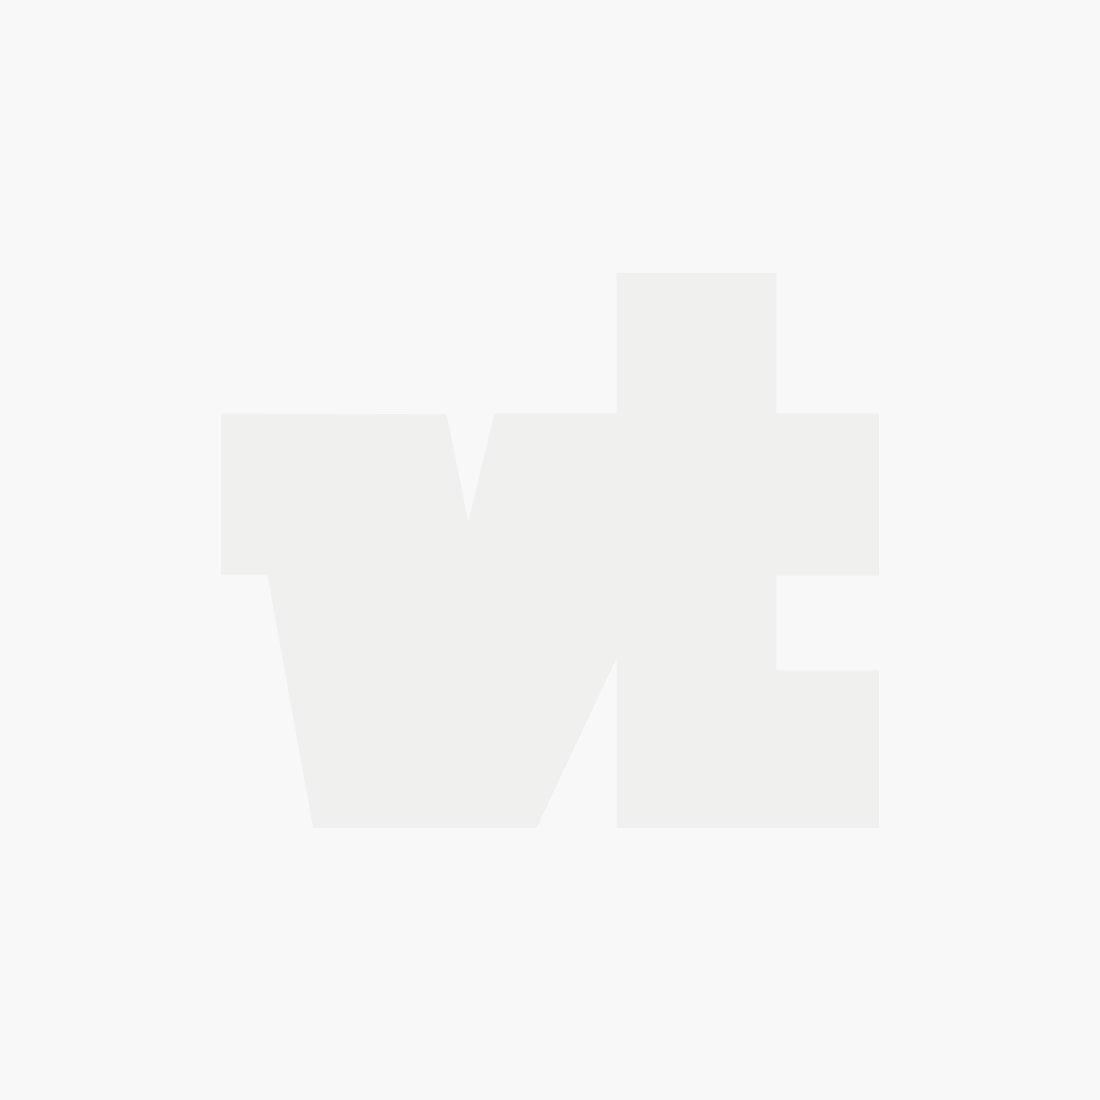 Fqsweetly-shirt birch